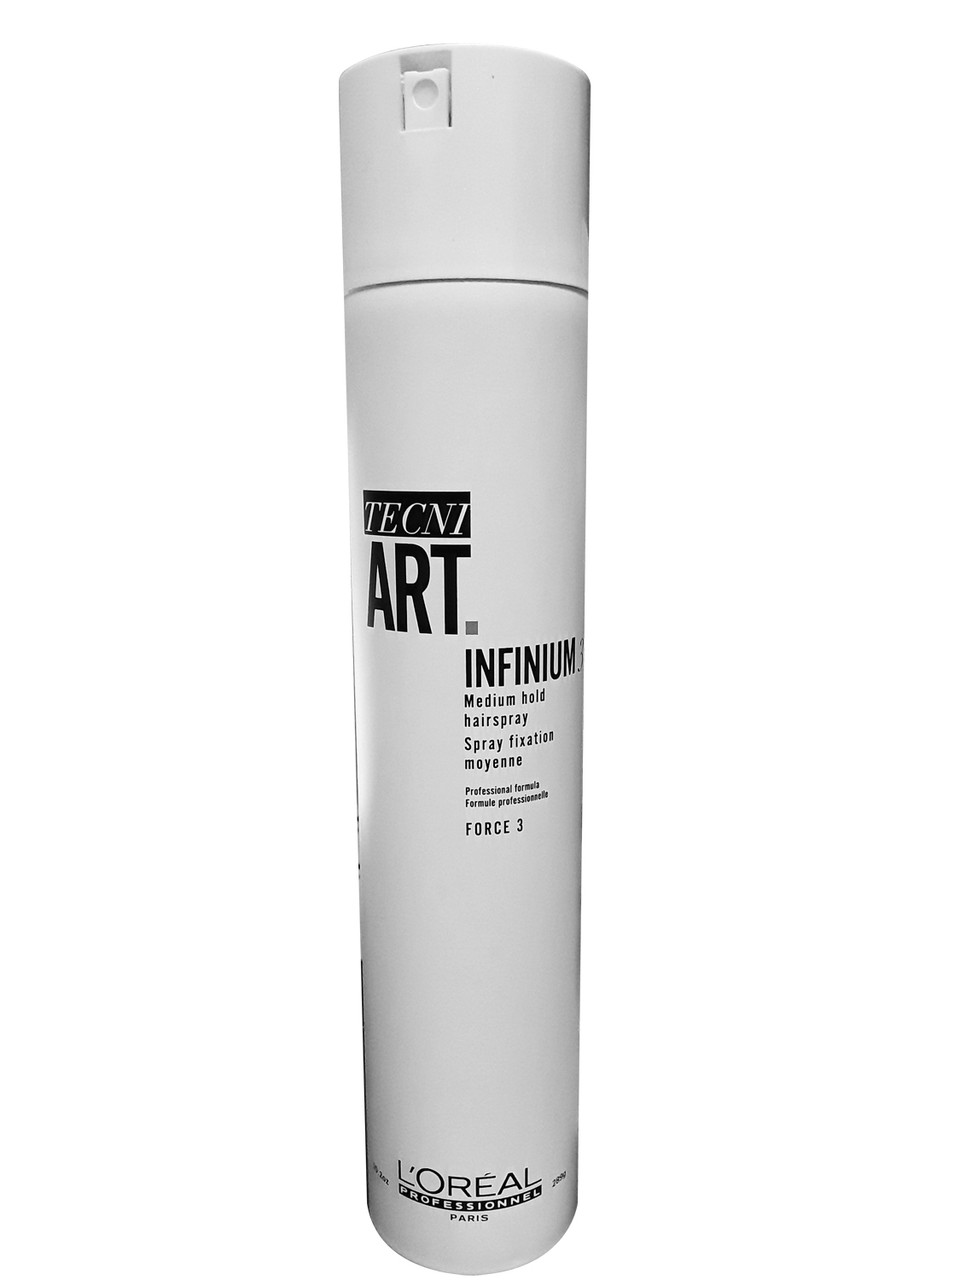 L'oreal Tecni Art Infinium 3 Strong Hold Working Spray 10.2 oz